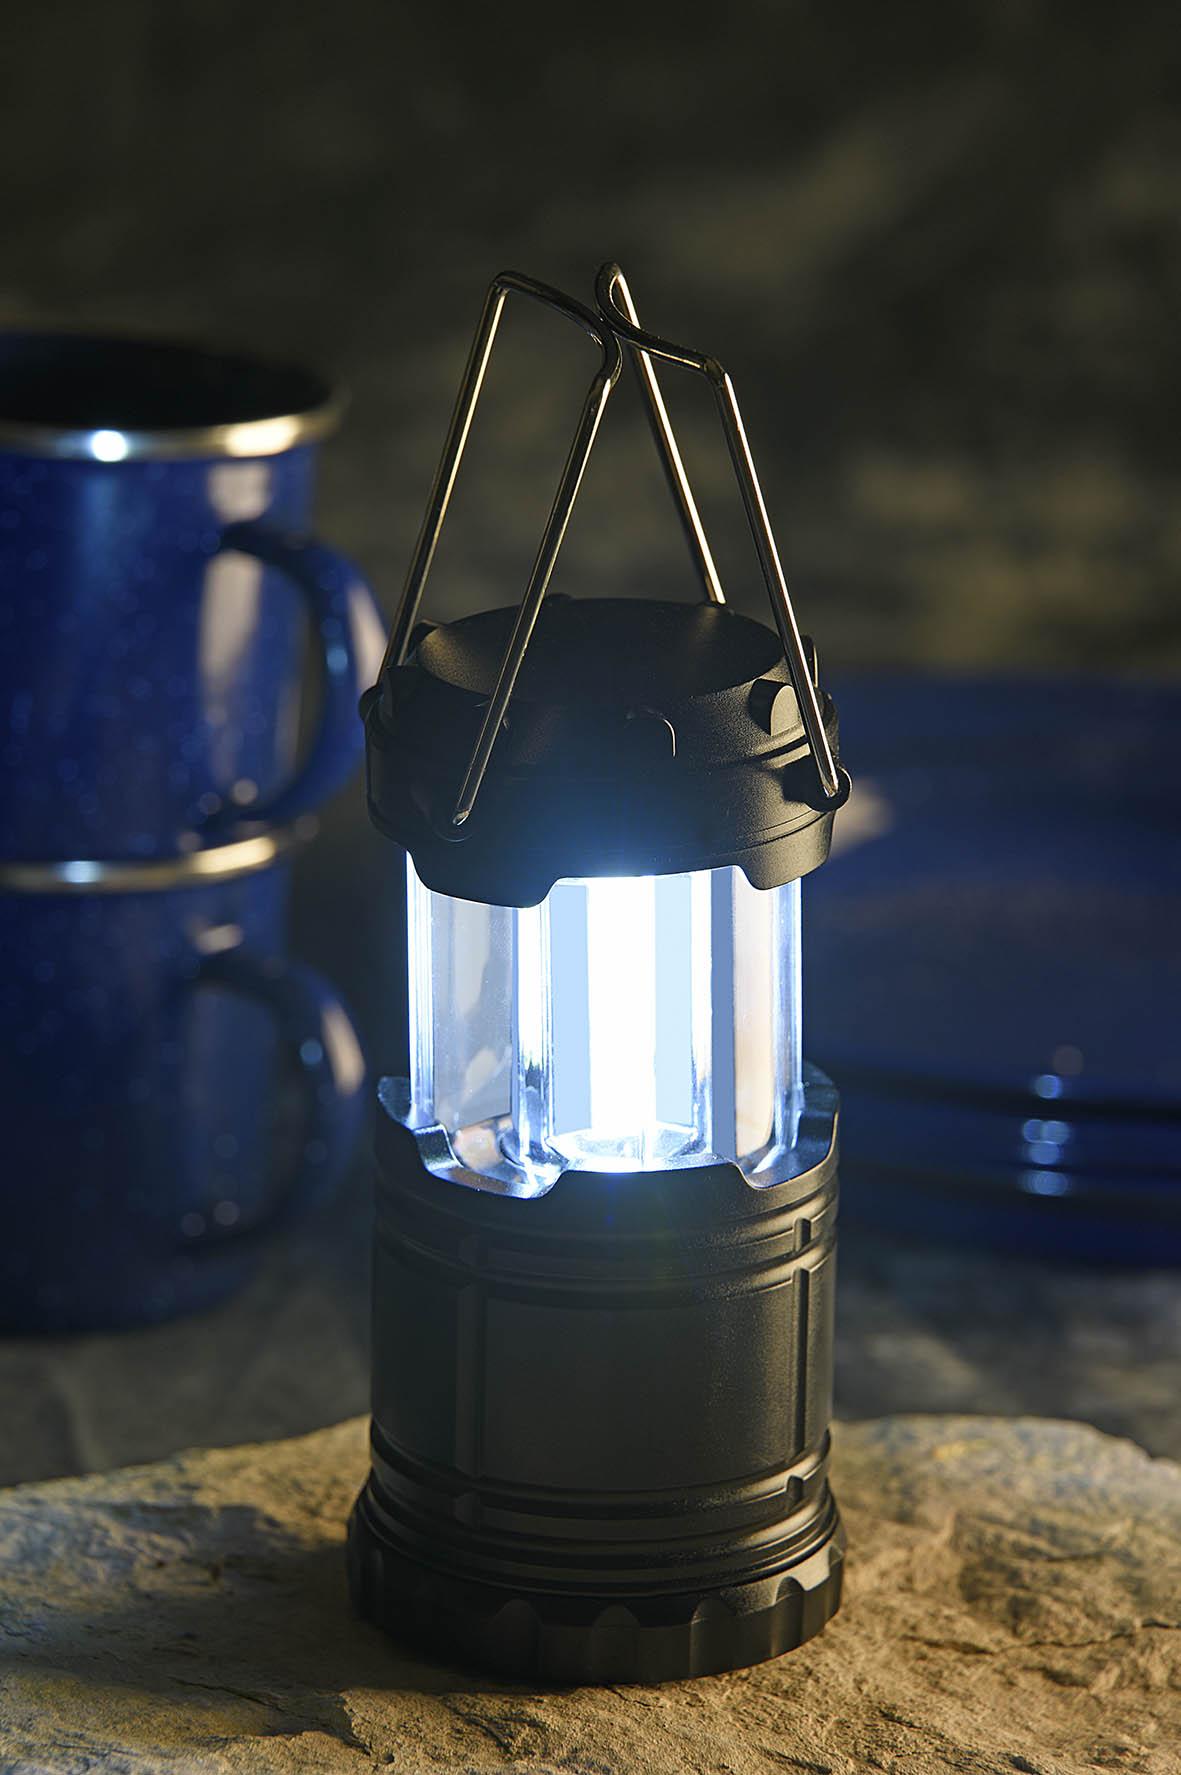 Werbeartikel: Tools, Leuchten, Licht=Campinglampe mini cob